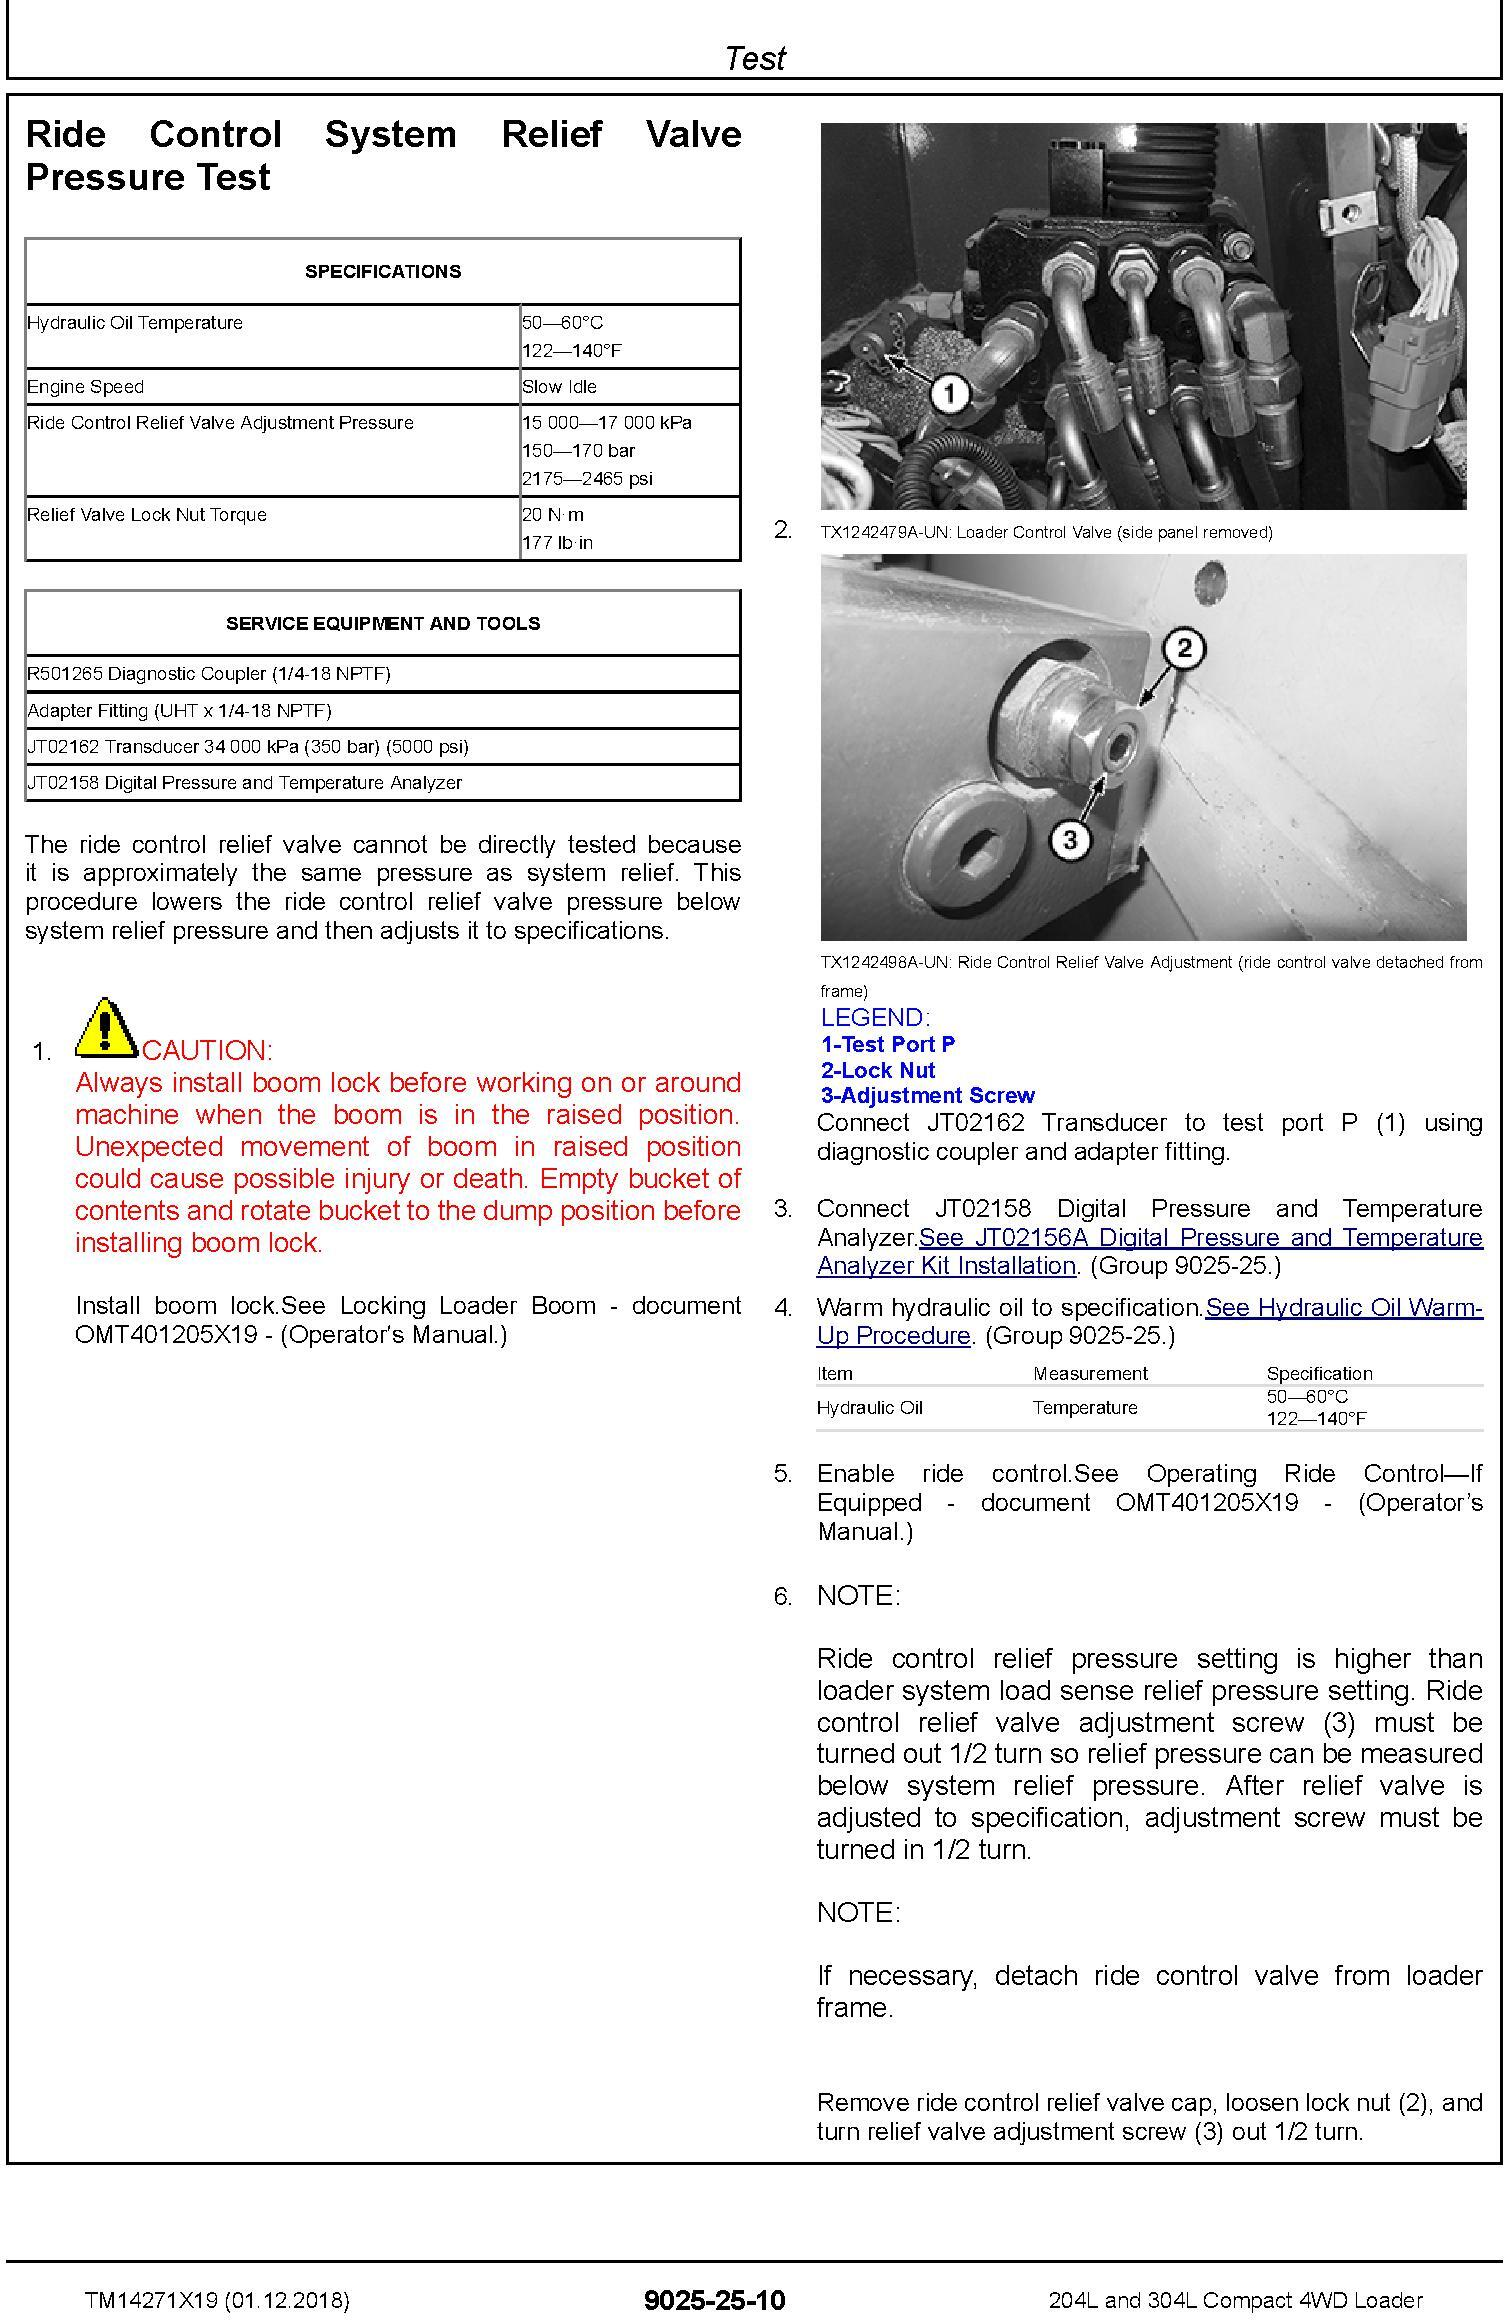 John Deere 204L,304L (SN.B040073-) Compact 4WD Loader Operation & Test Technical Manual (TM14271X19) - 3